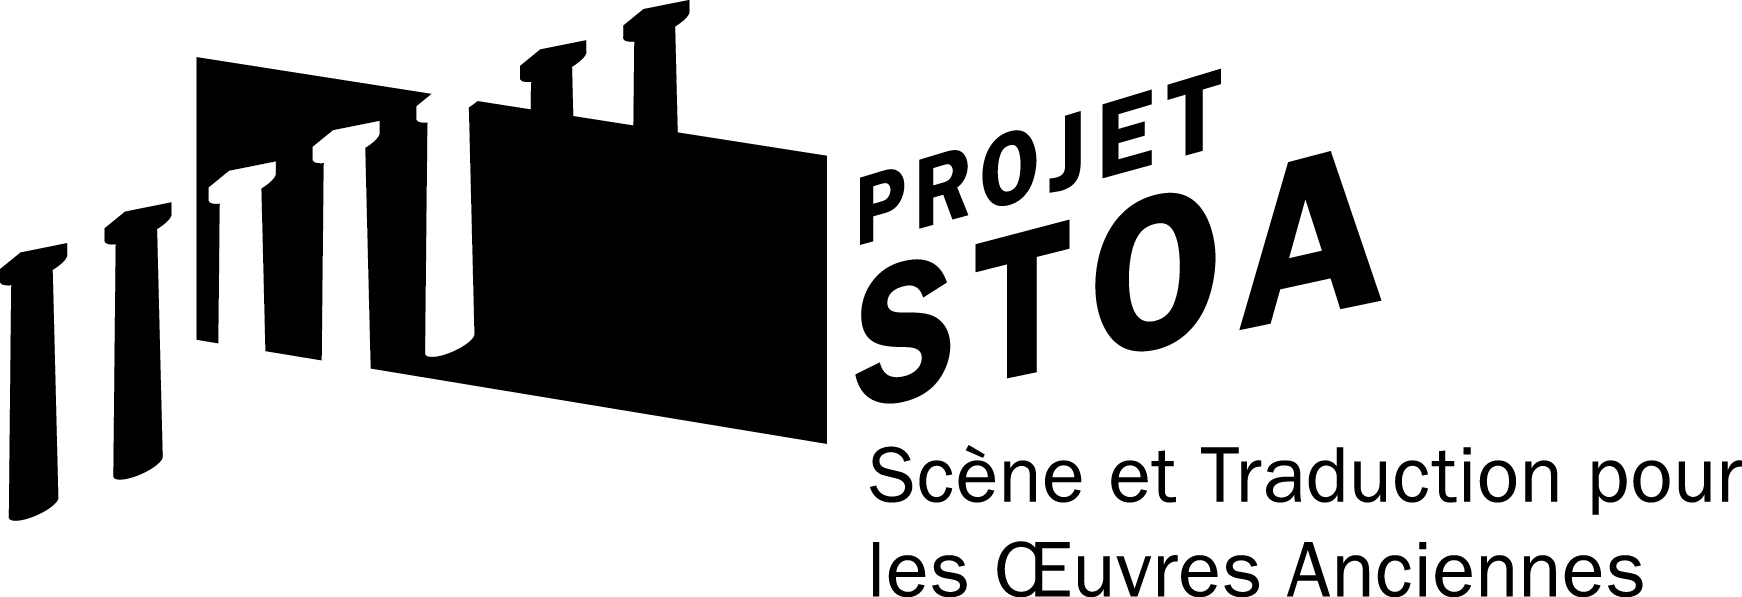 STOA_logo_nb_def